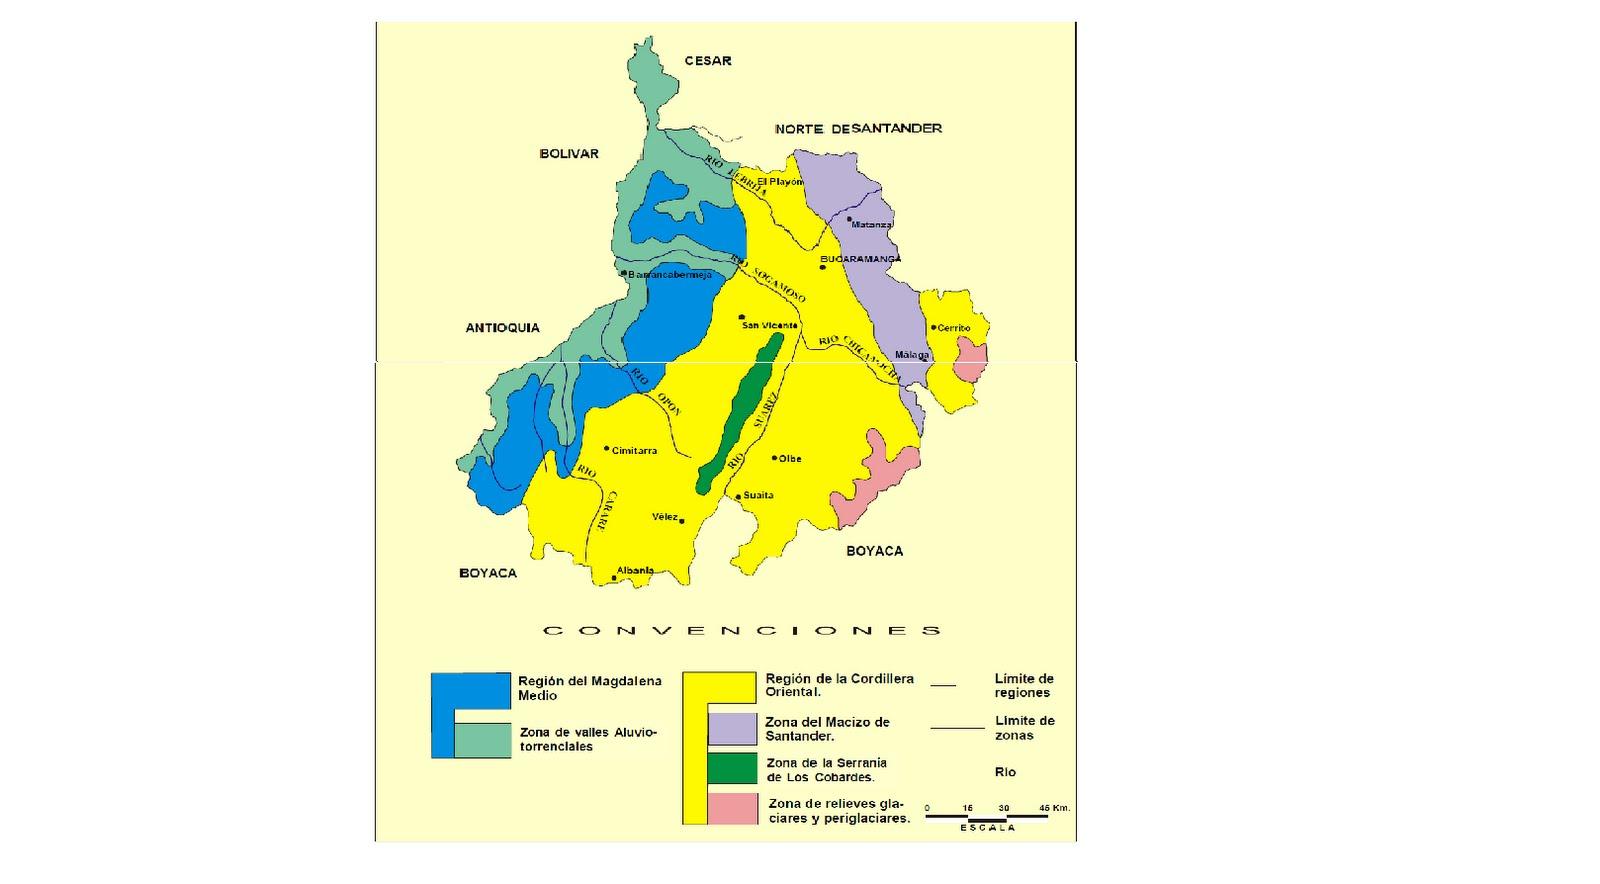 Santander limpia hidrografia santander mapa for Banco santander mas cercano a mi ubicacion